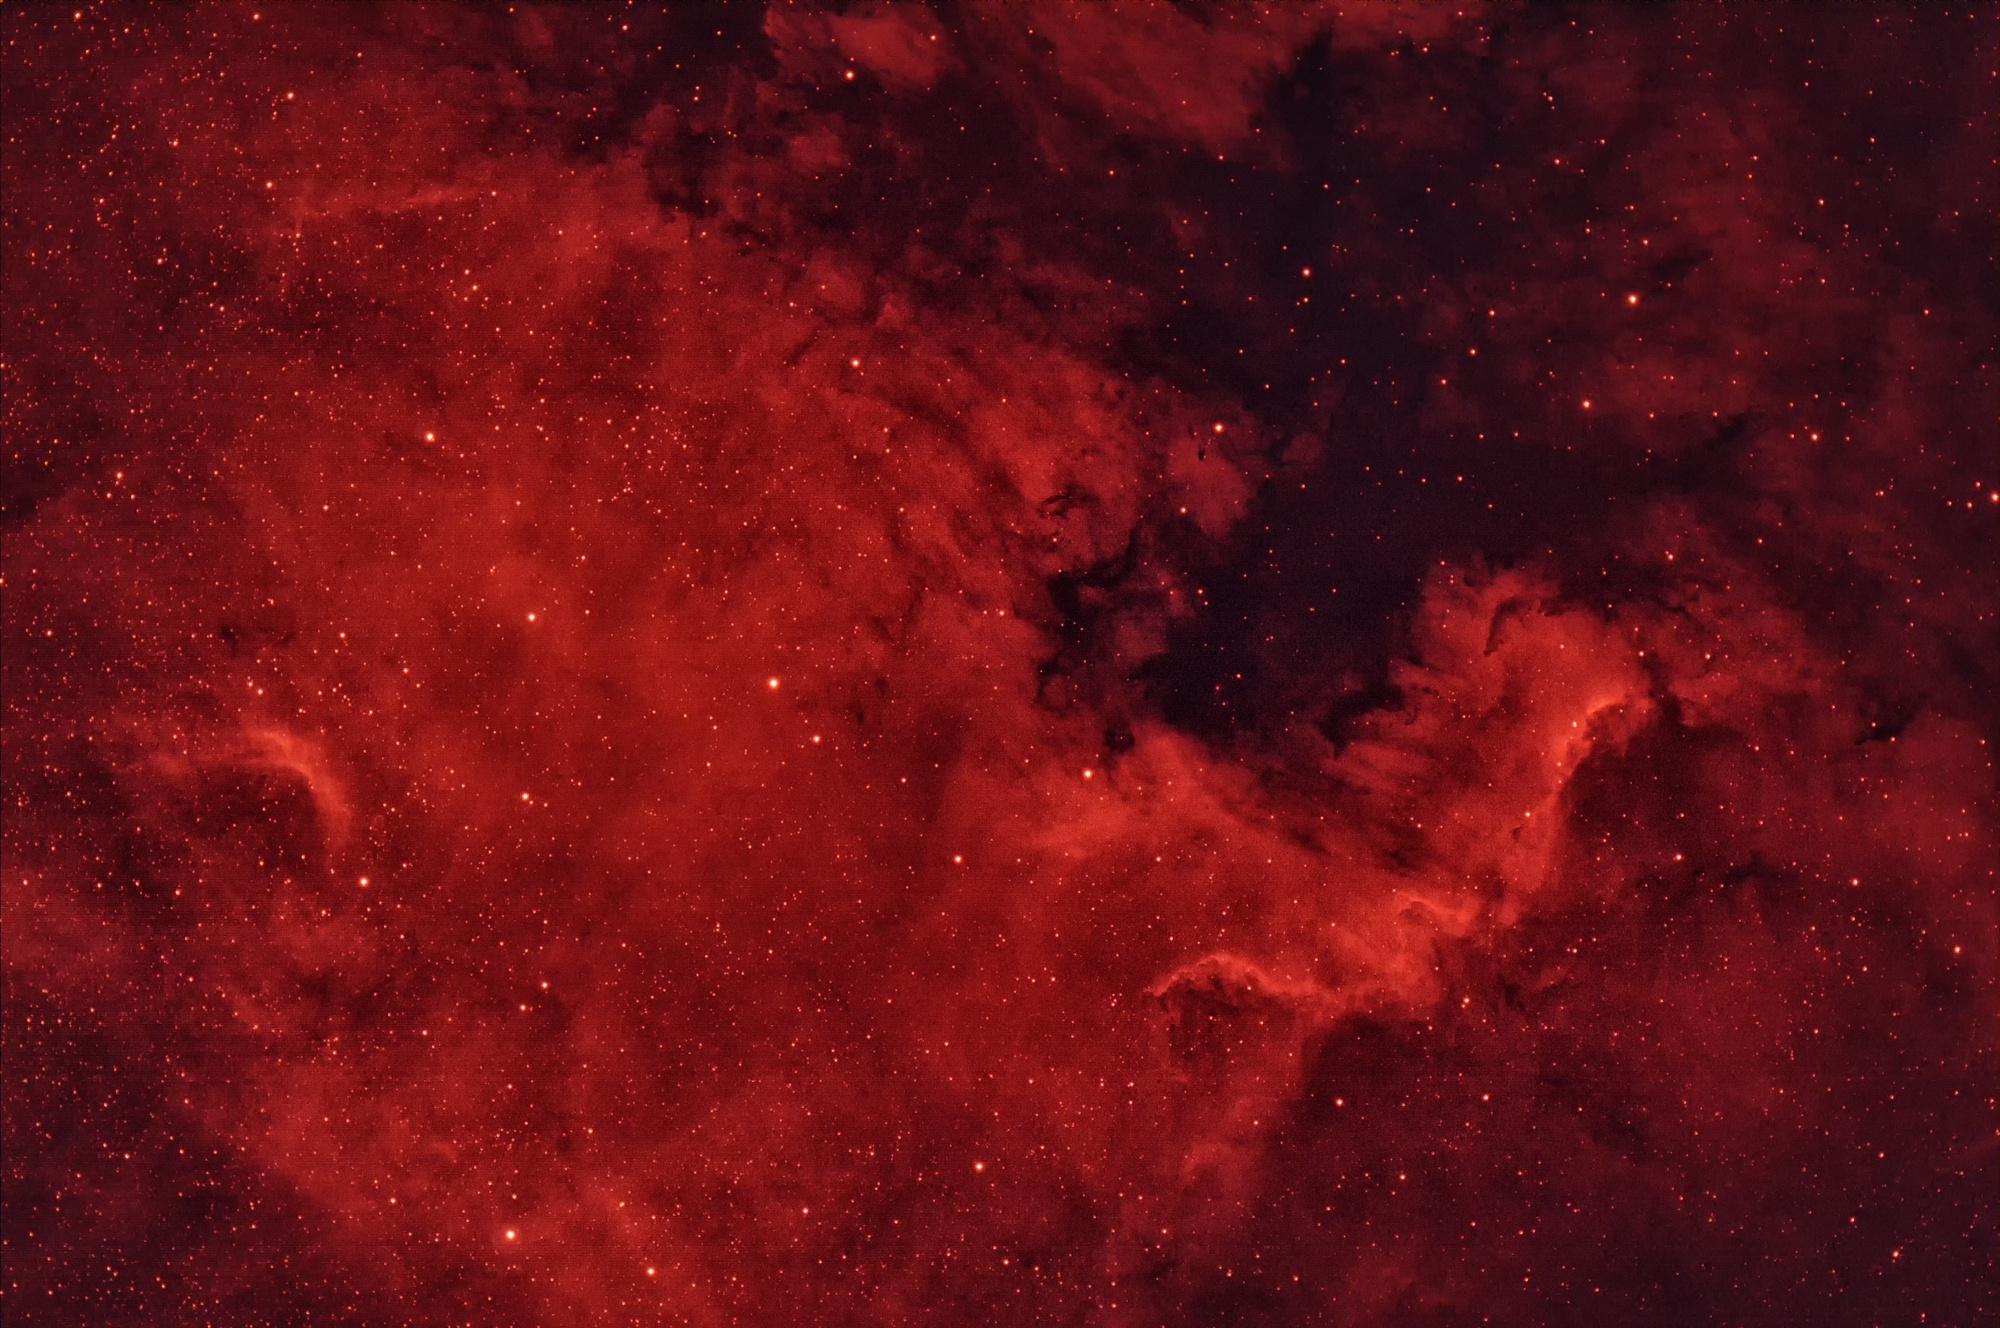 Nebula Red Space Stars 2000x1328